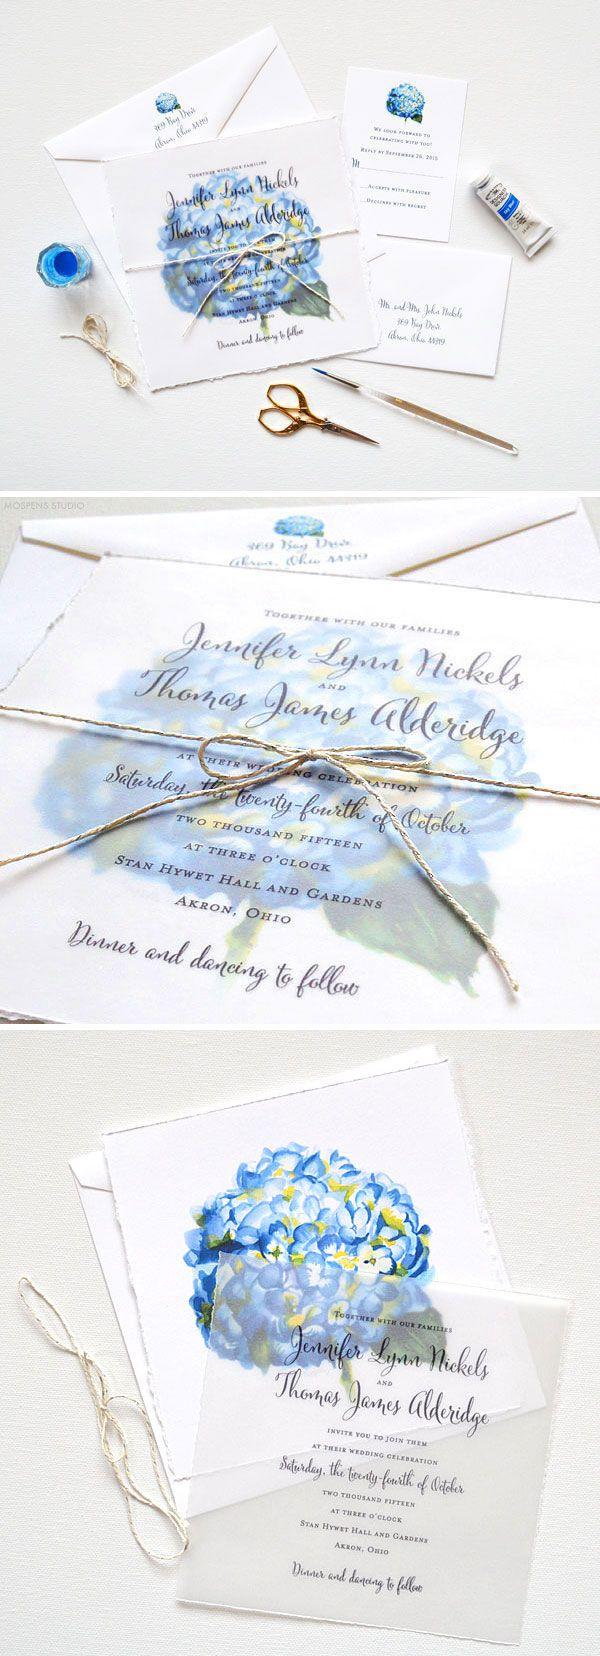 Purple hydrangea wedding invitation sample - Send Your Guests An Art Print Invitation Watercolor Wedding Invitation Suite With Original Hand Painted